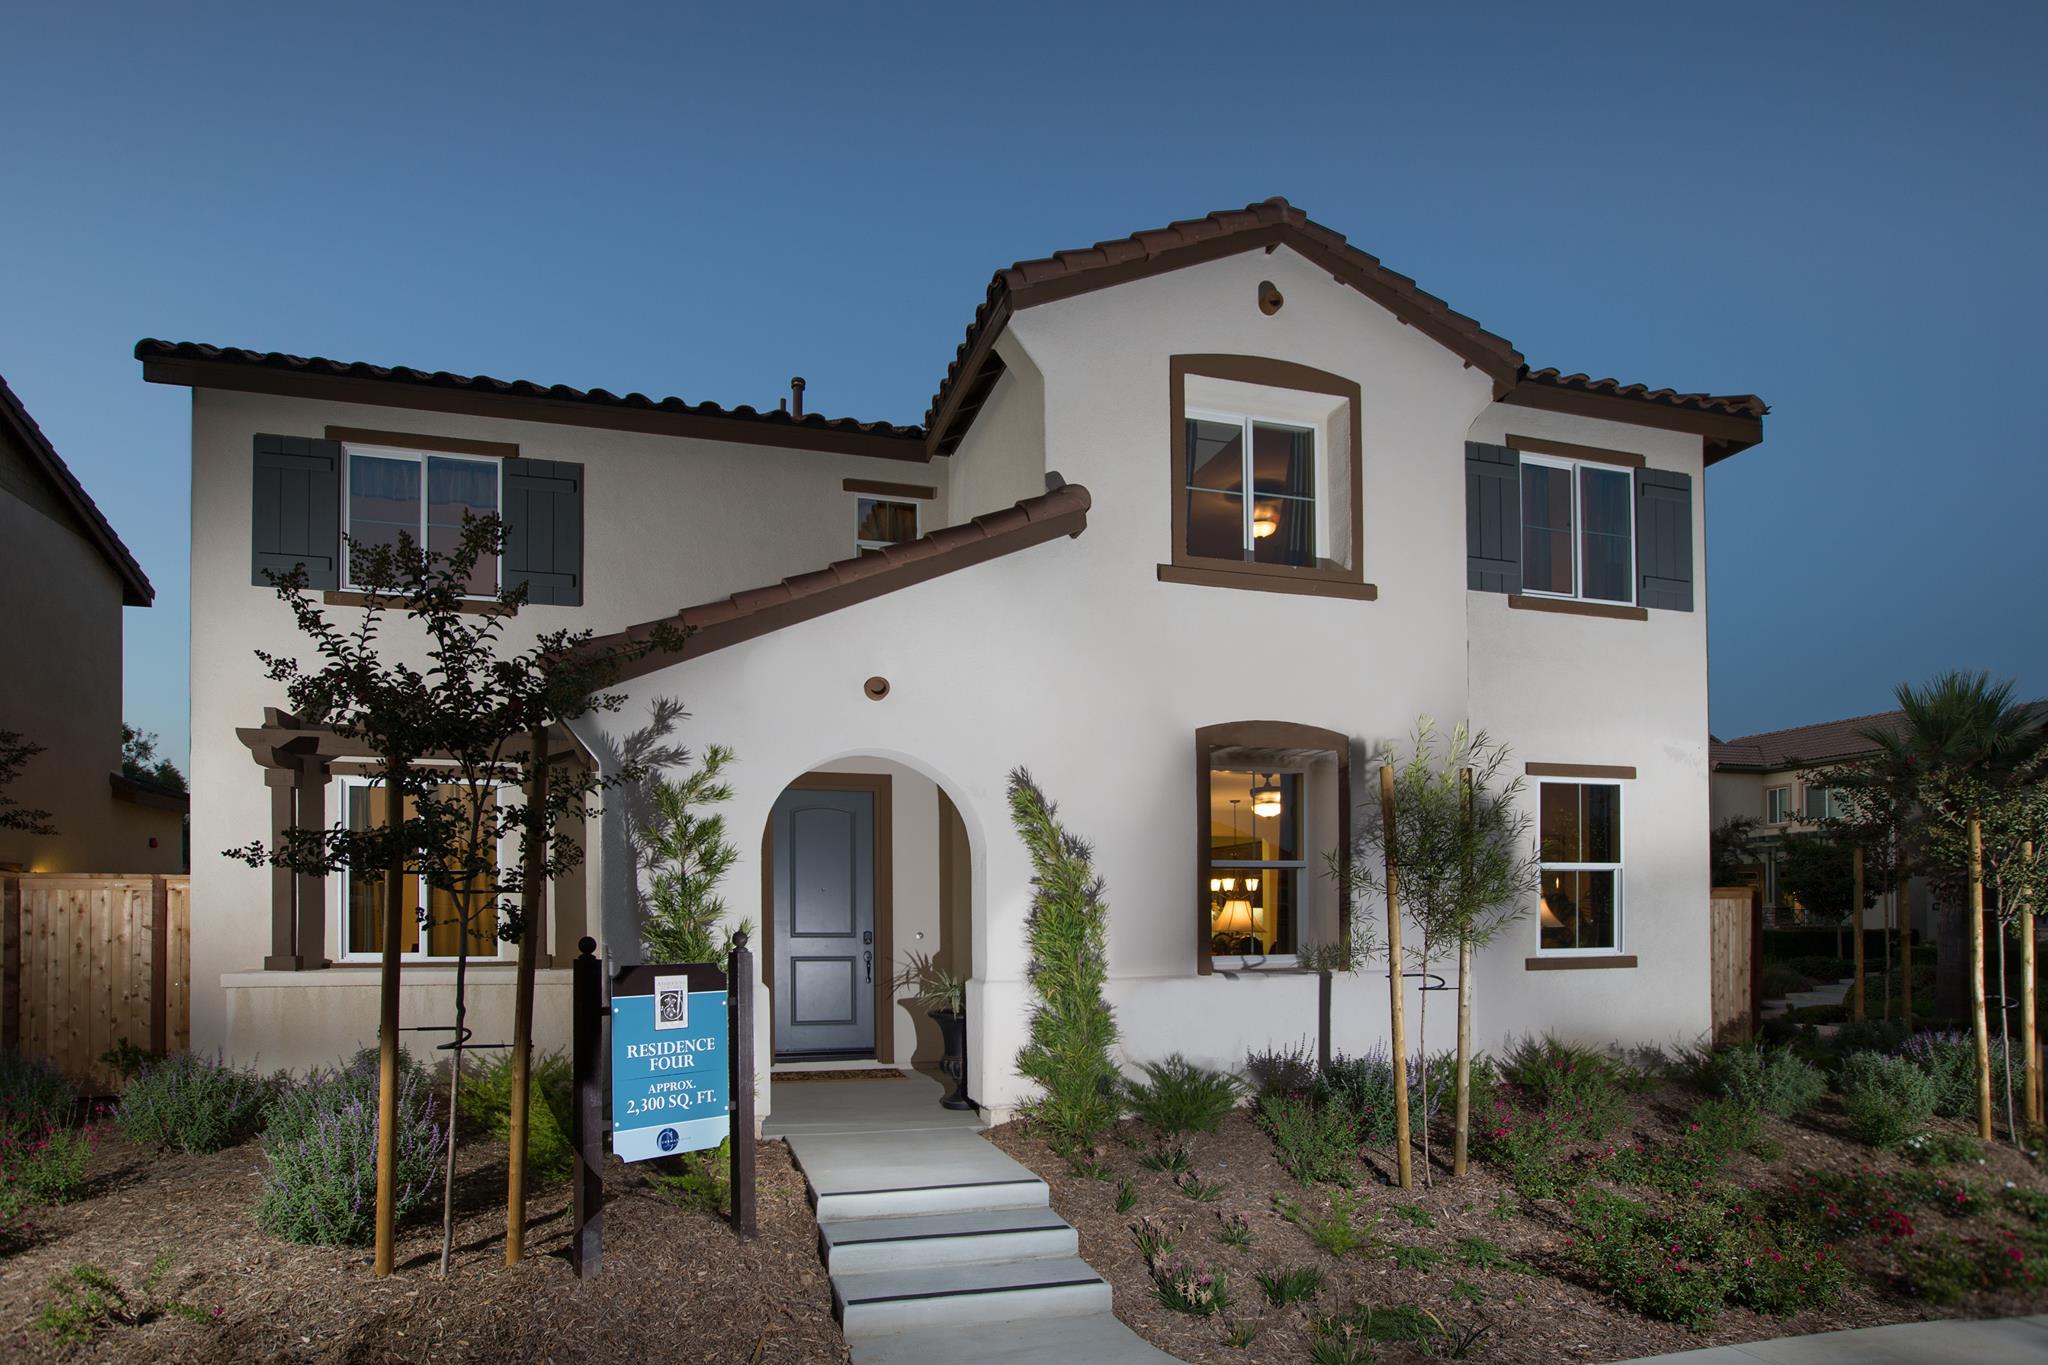 Atherton Square Community - Riverside California